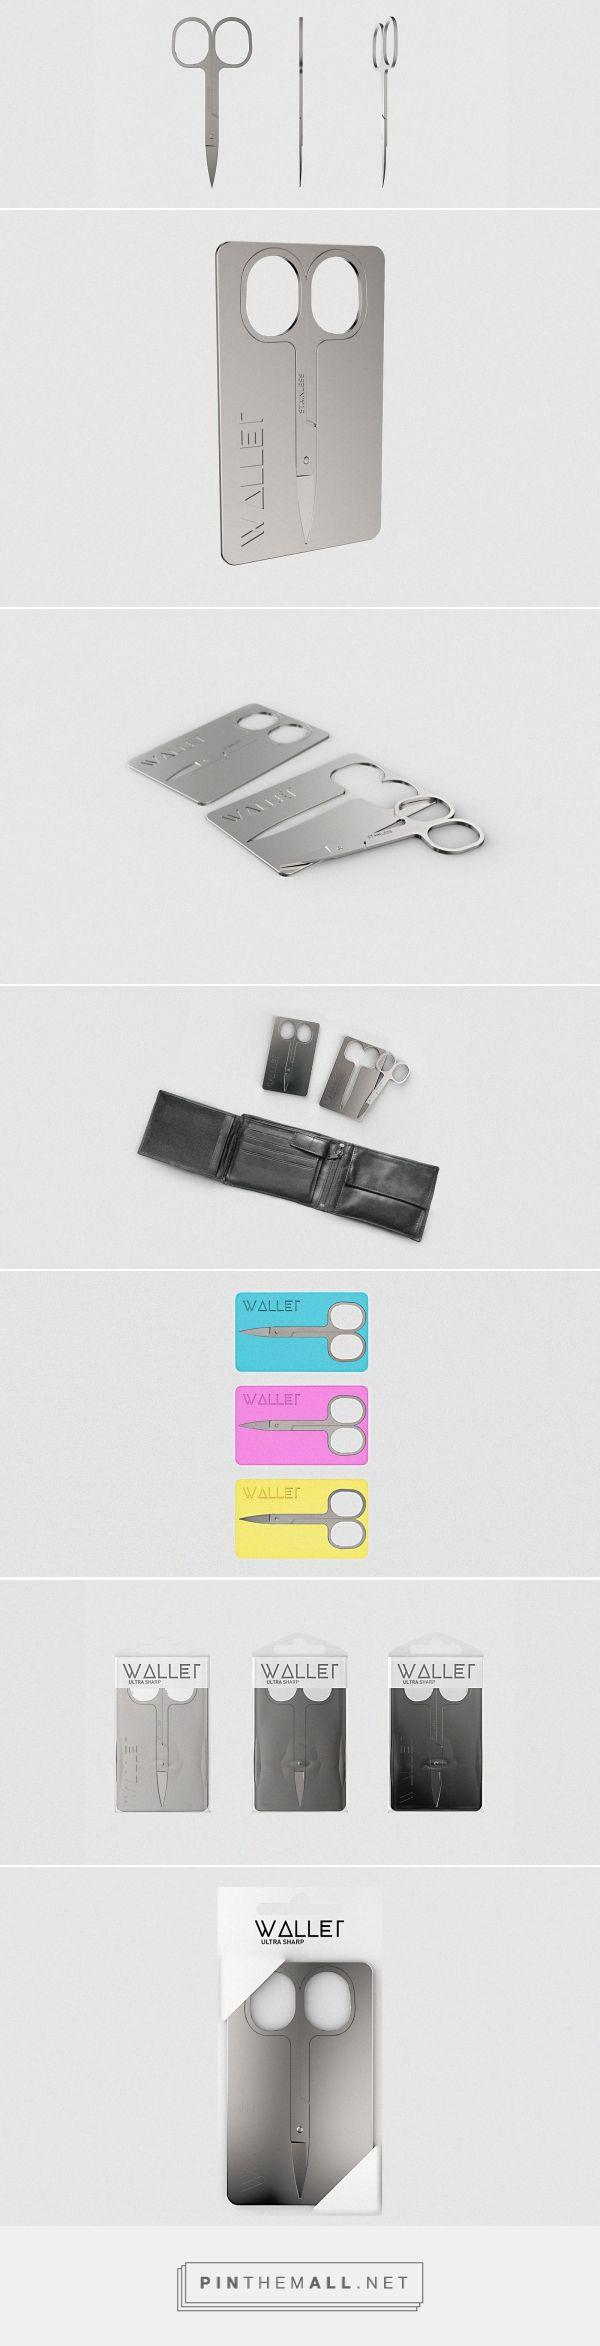 Wallet Nail Scissors packaging design by Annabella Hevesi - http://www.packagingoftheworld.com/2016/11/wallet-nail-scissors.html